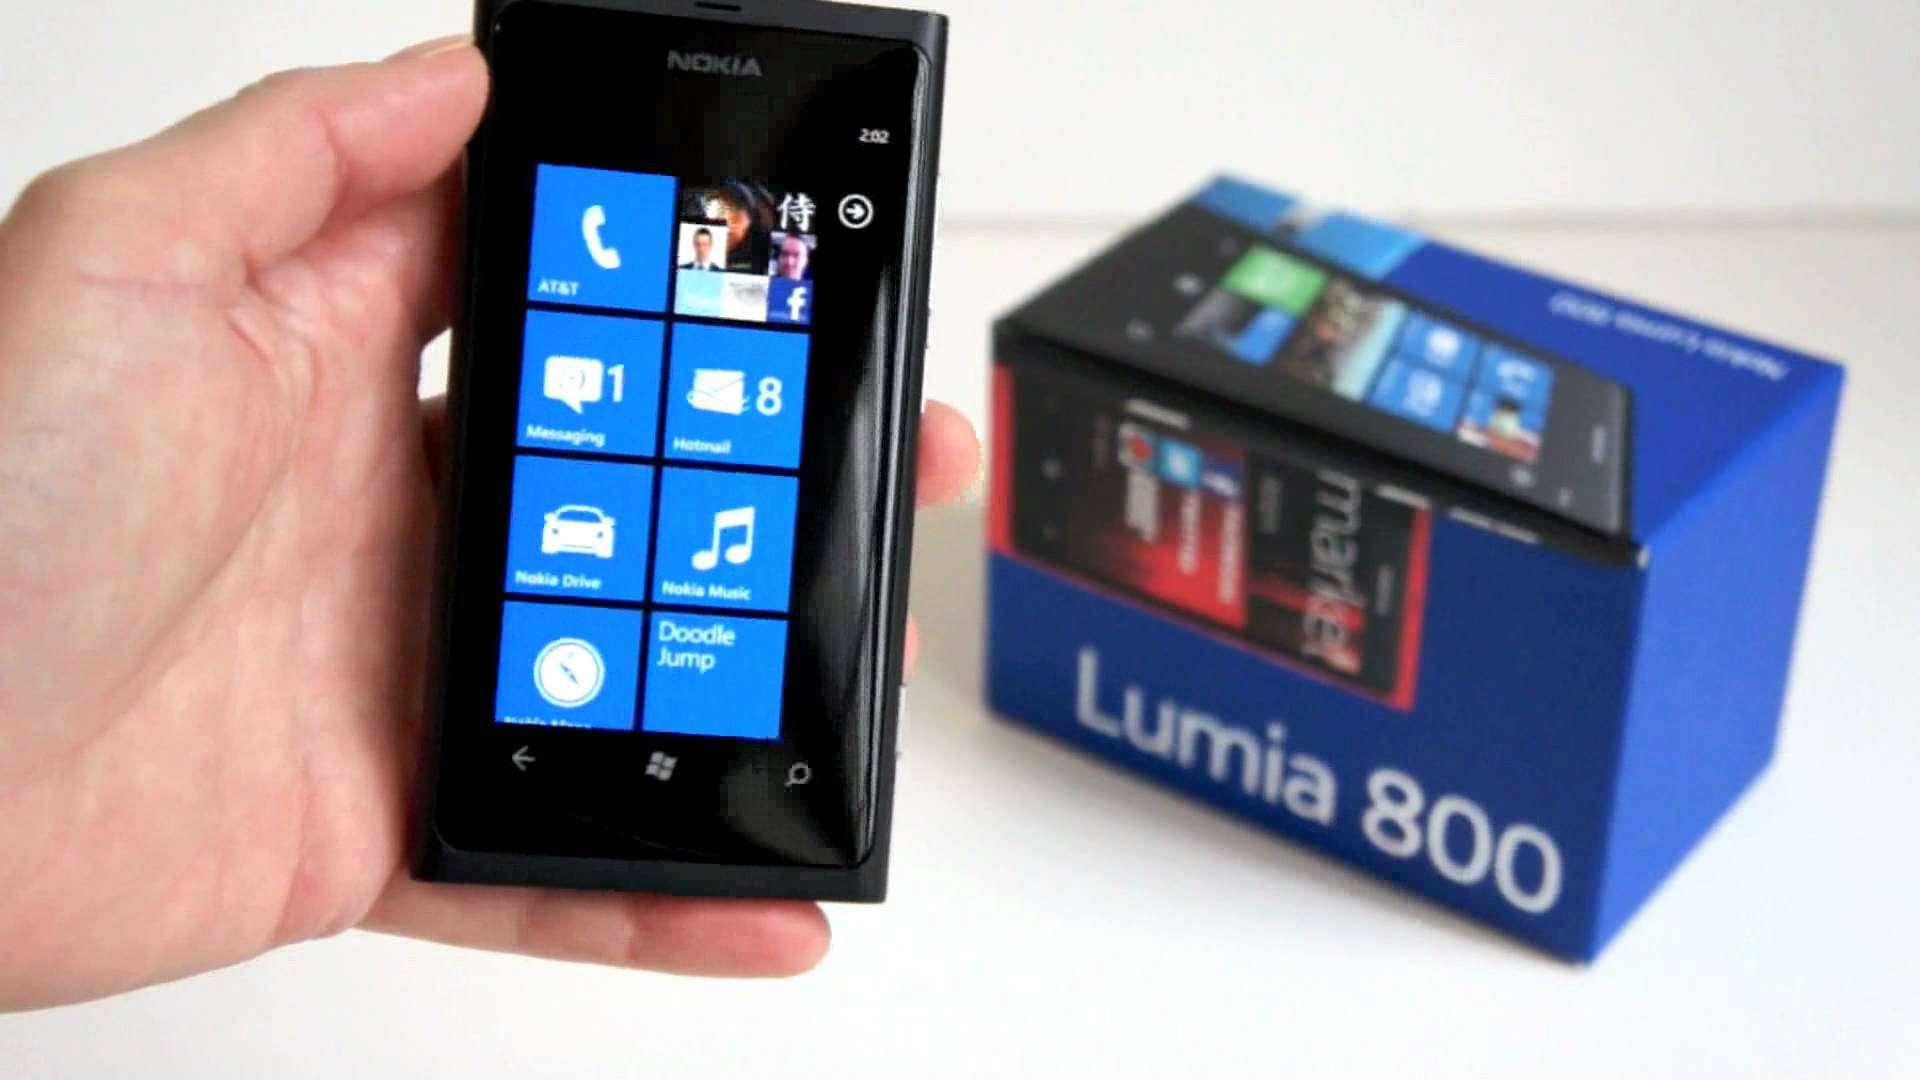 Nokia lumia 520 skype video call